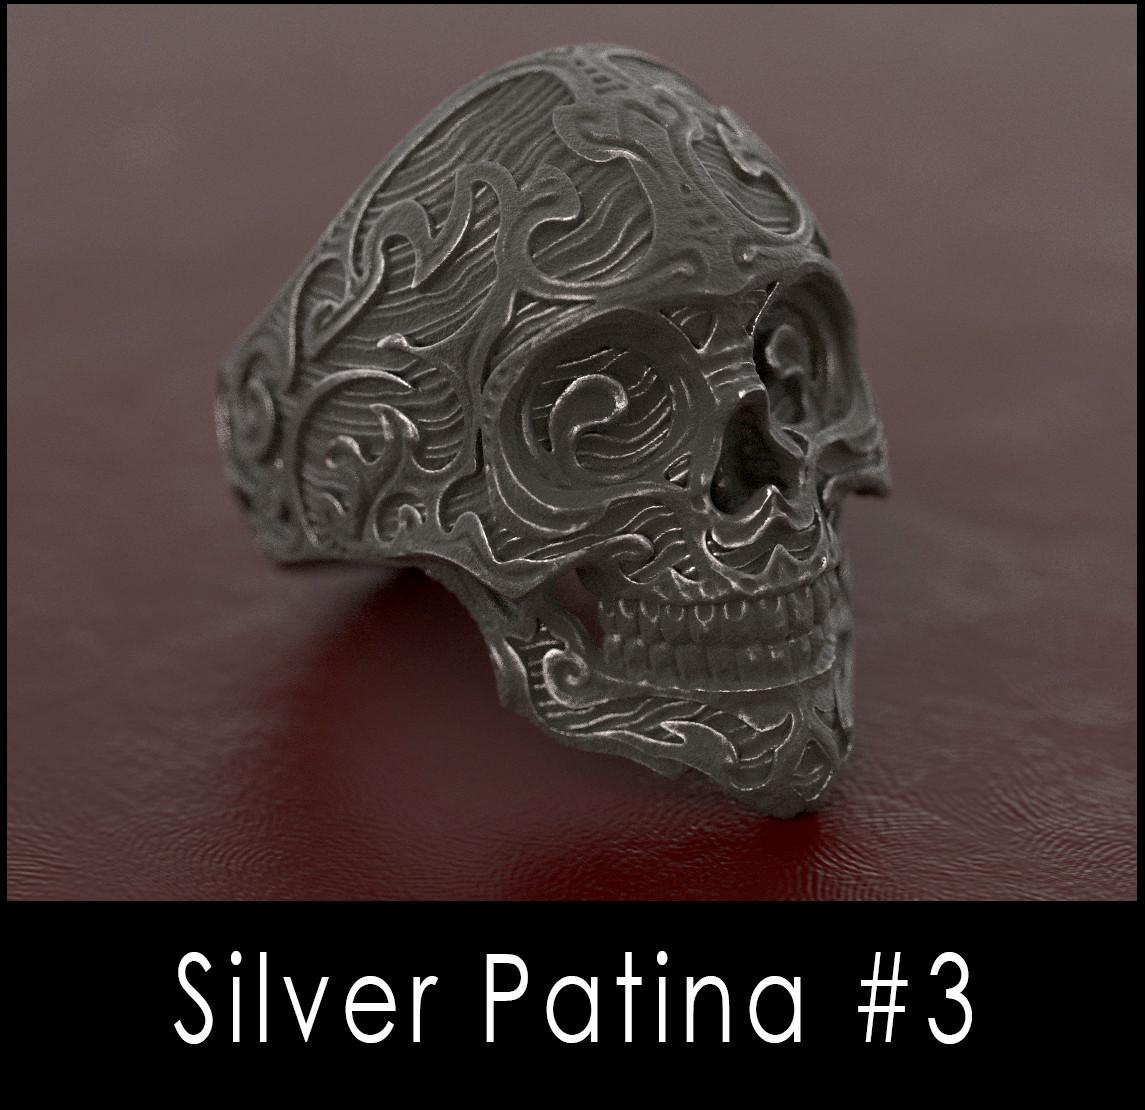 Nacho riesco gostanza silver patina n3